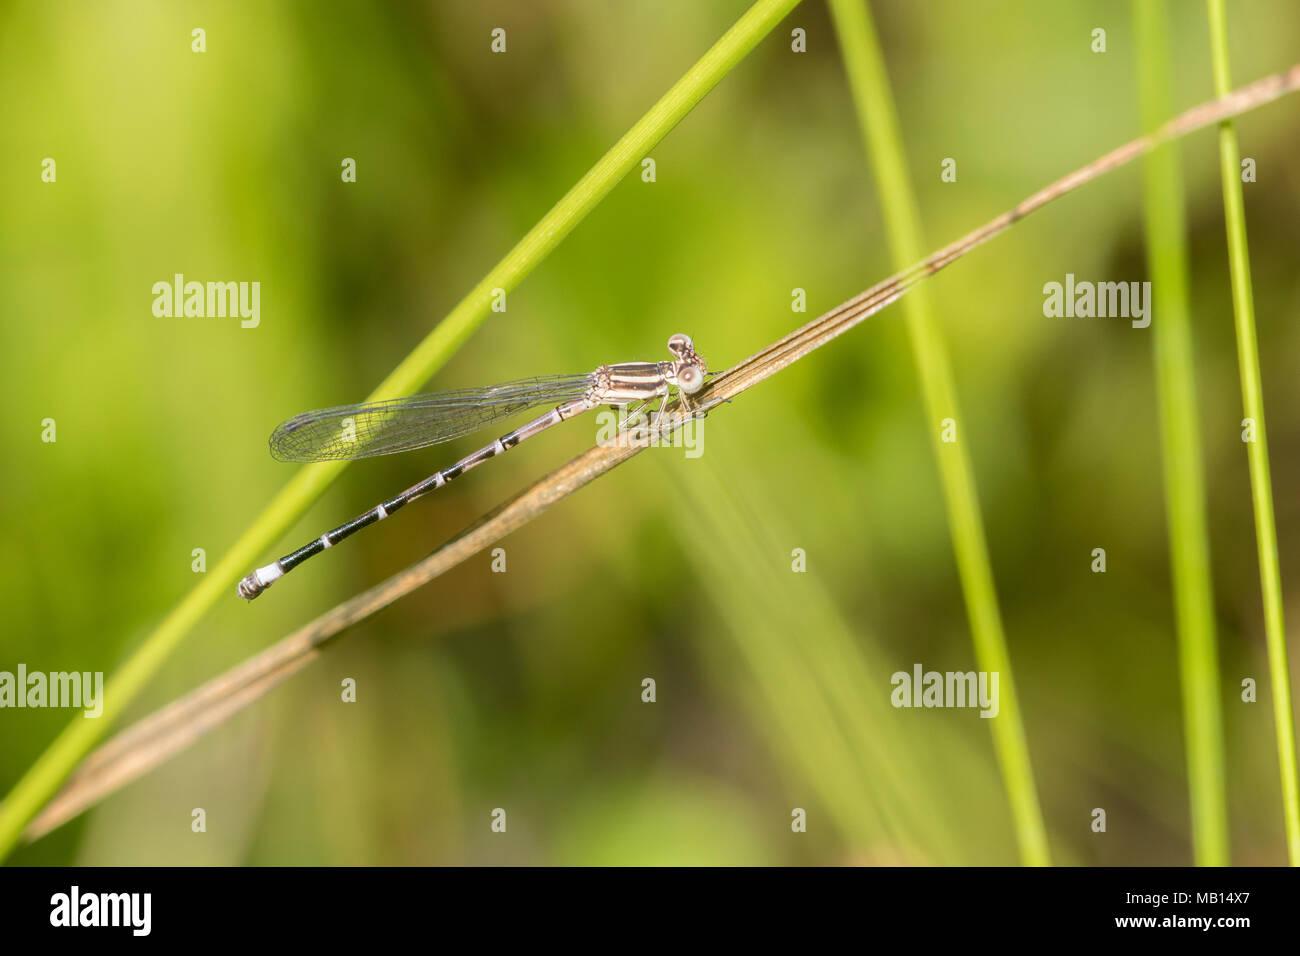 06067-00111 Seepage Dancer (Argia bipunctulata) female Bee Fork West Fen Reynolds Co. MO - Stock Image